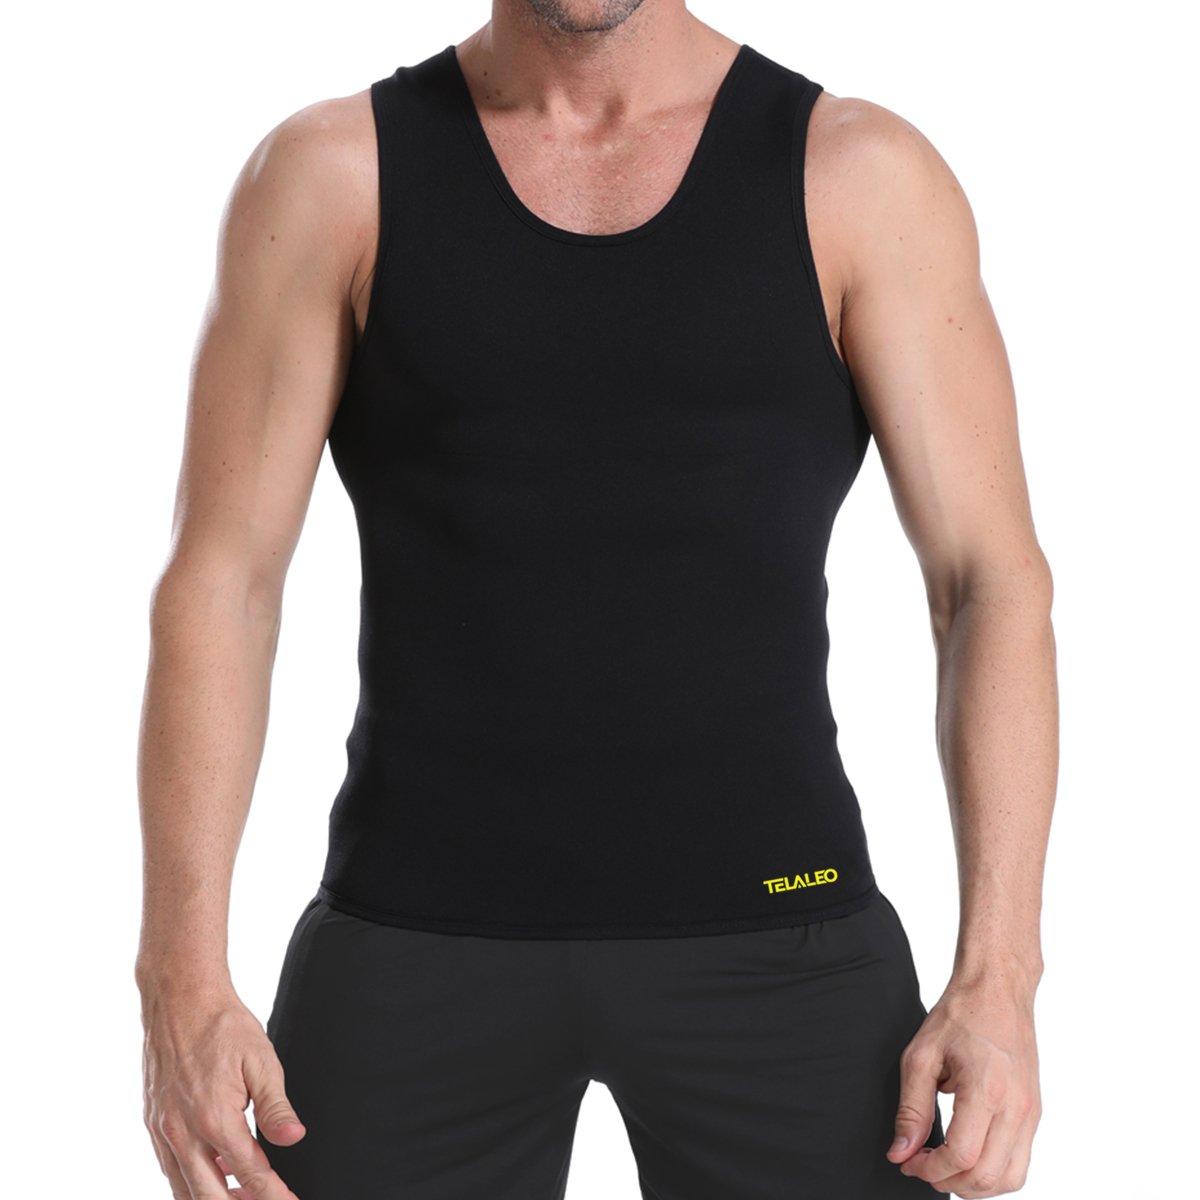 e26676b338 Amazon.com  TELALEO Neoprene Sauna Vest for Men